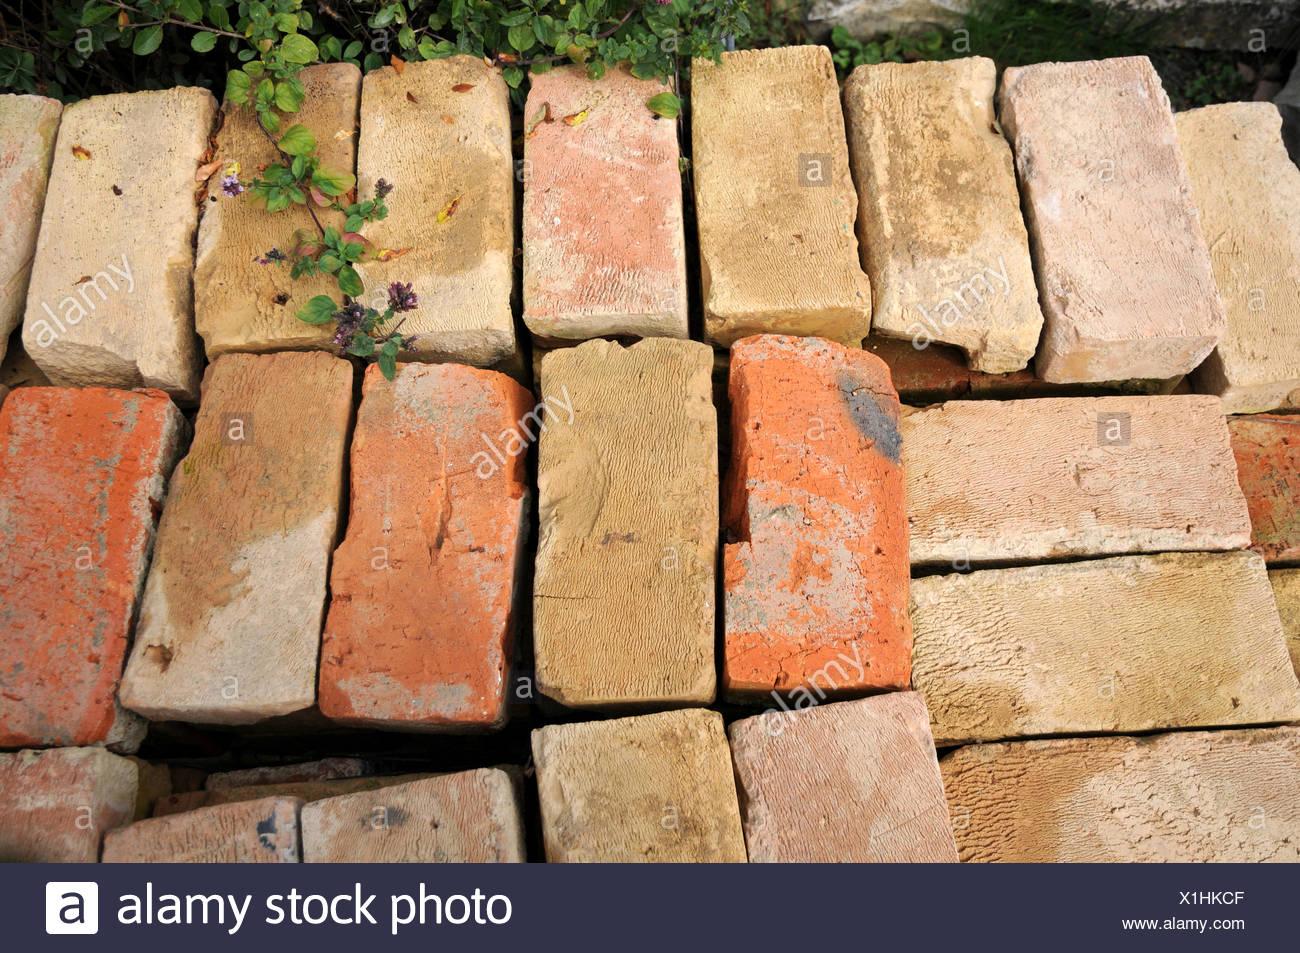 Old handmade bricks - Stock Image